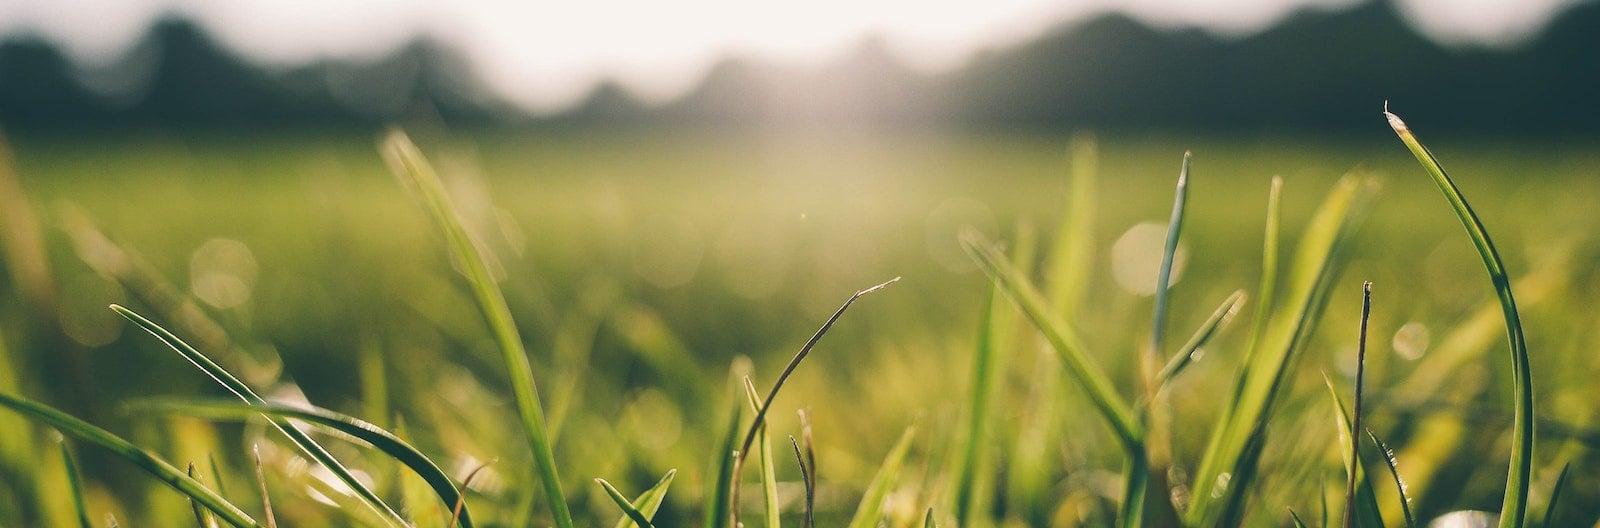 grass-meadow-sunshine-9056-1